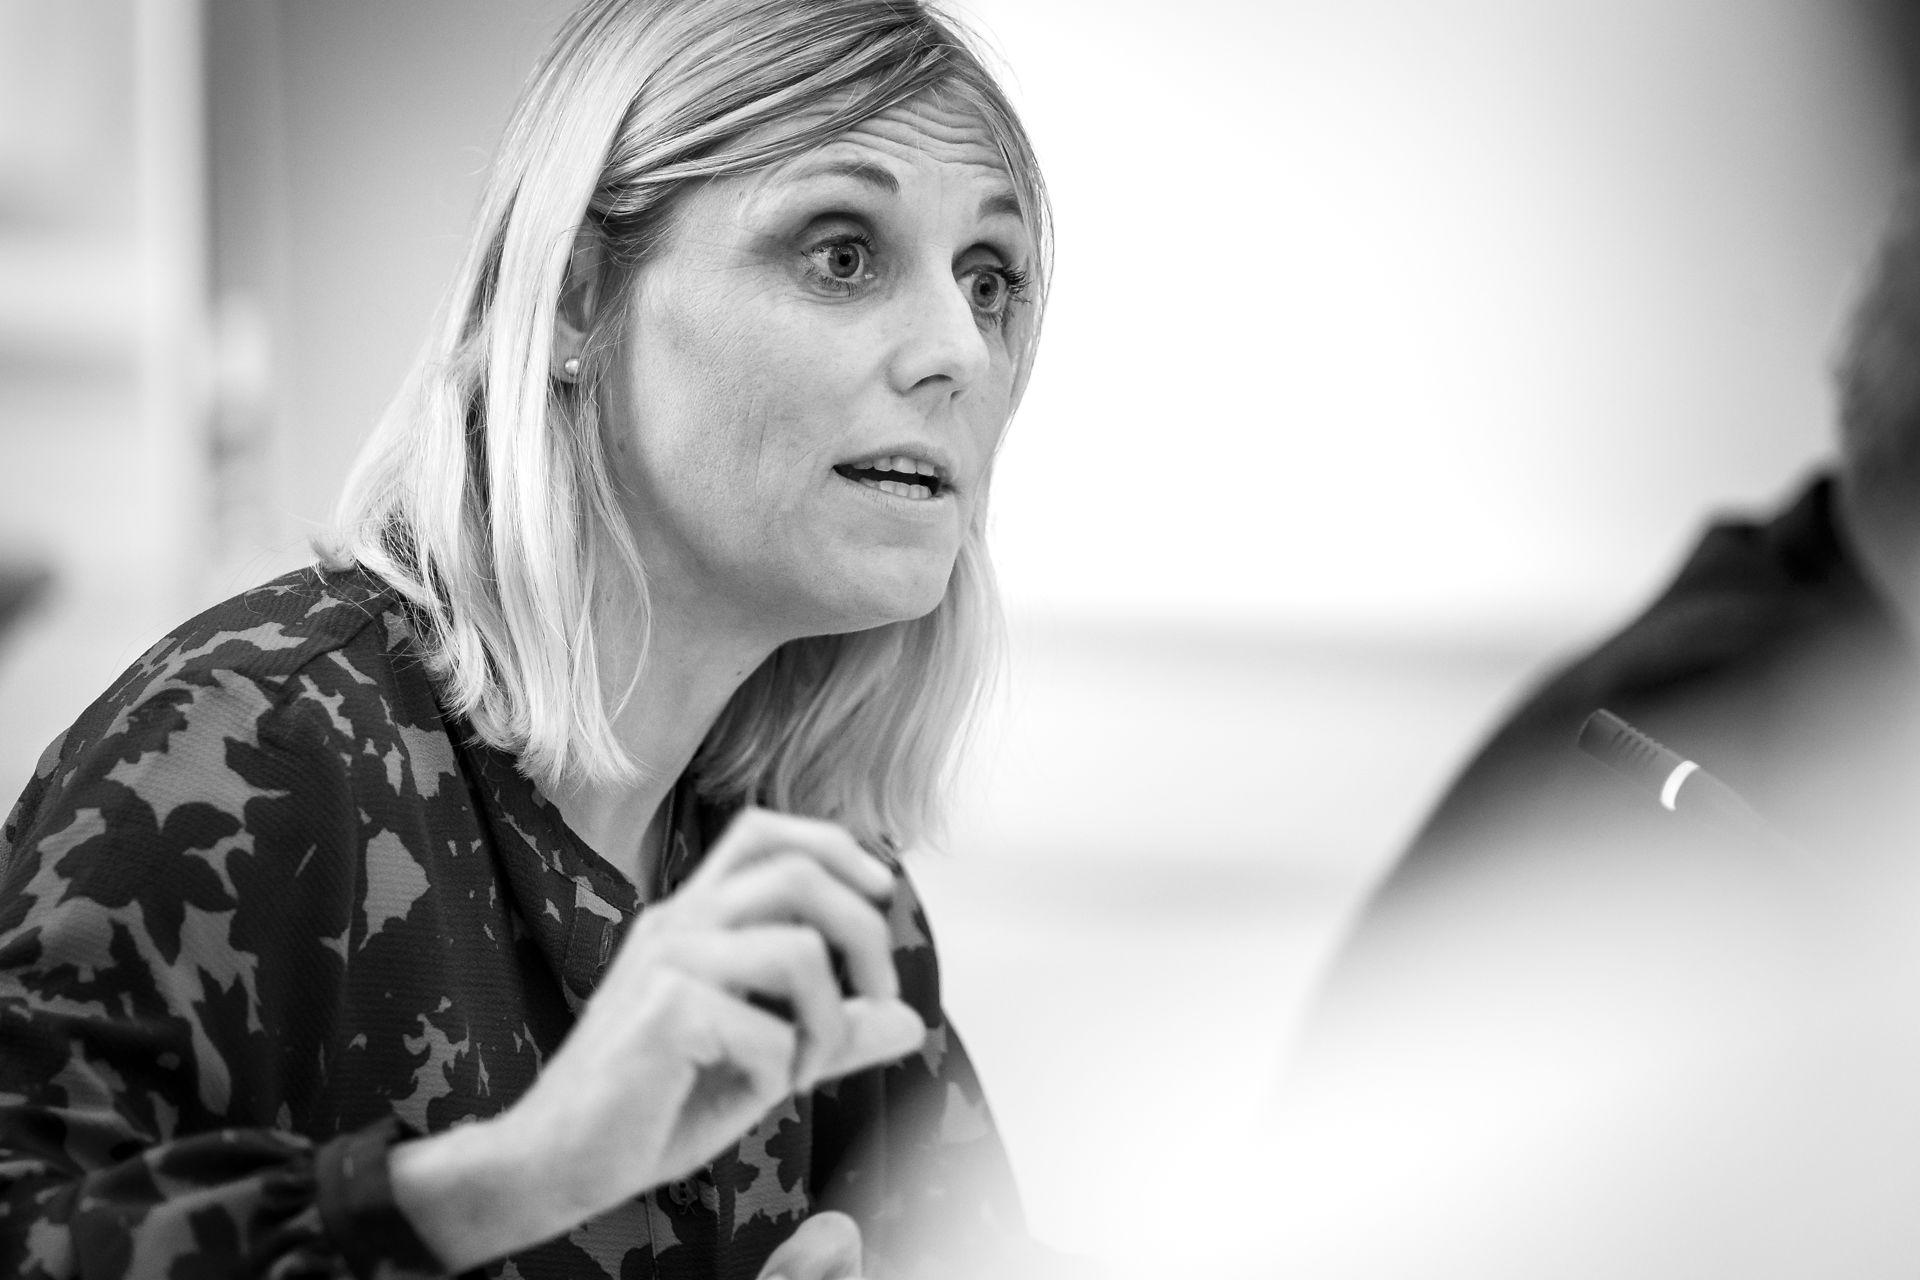 "<span class=""rodt"">Minkskandalen:</span> Minister anklager DR for ""ulødig journalistik"""